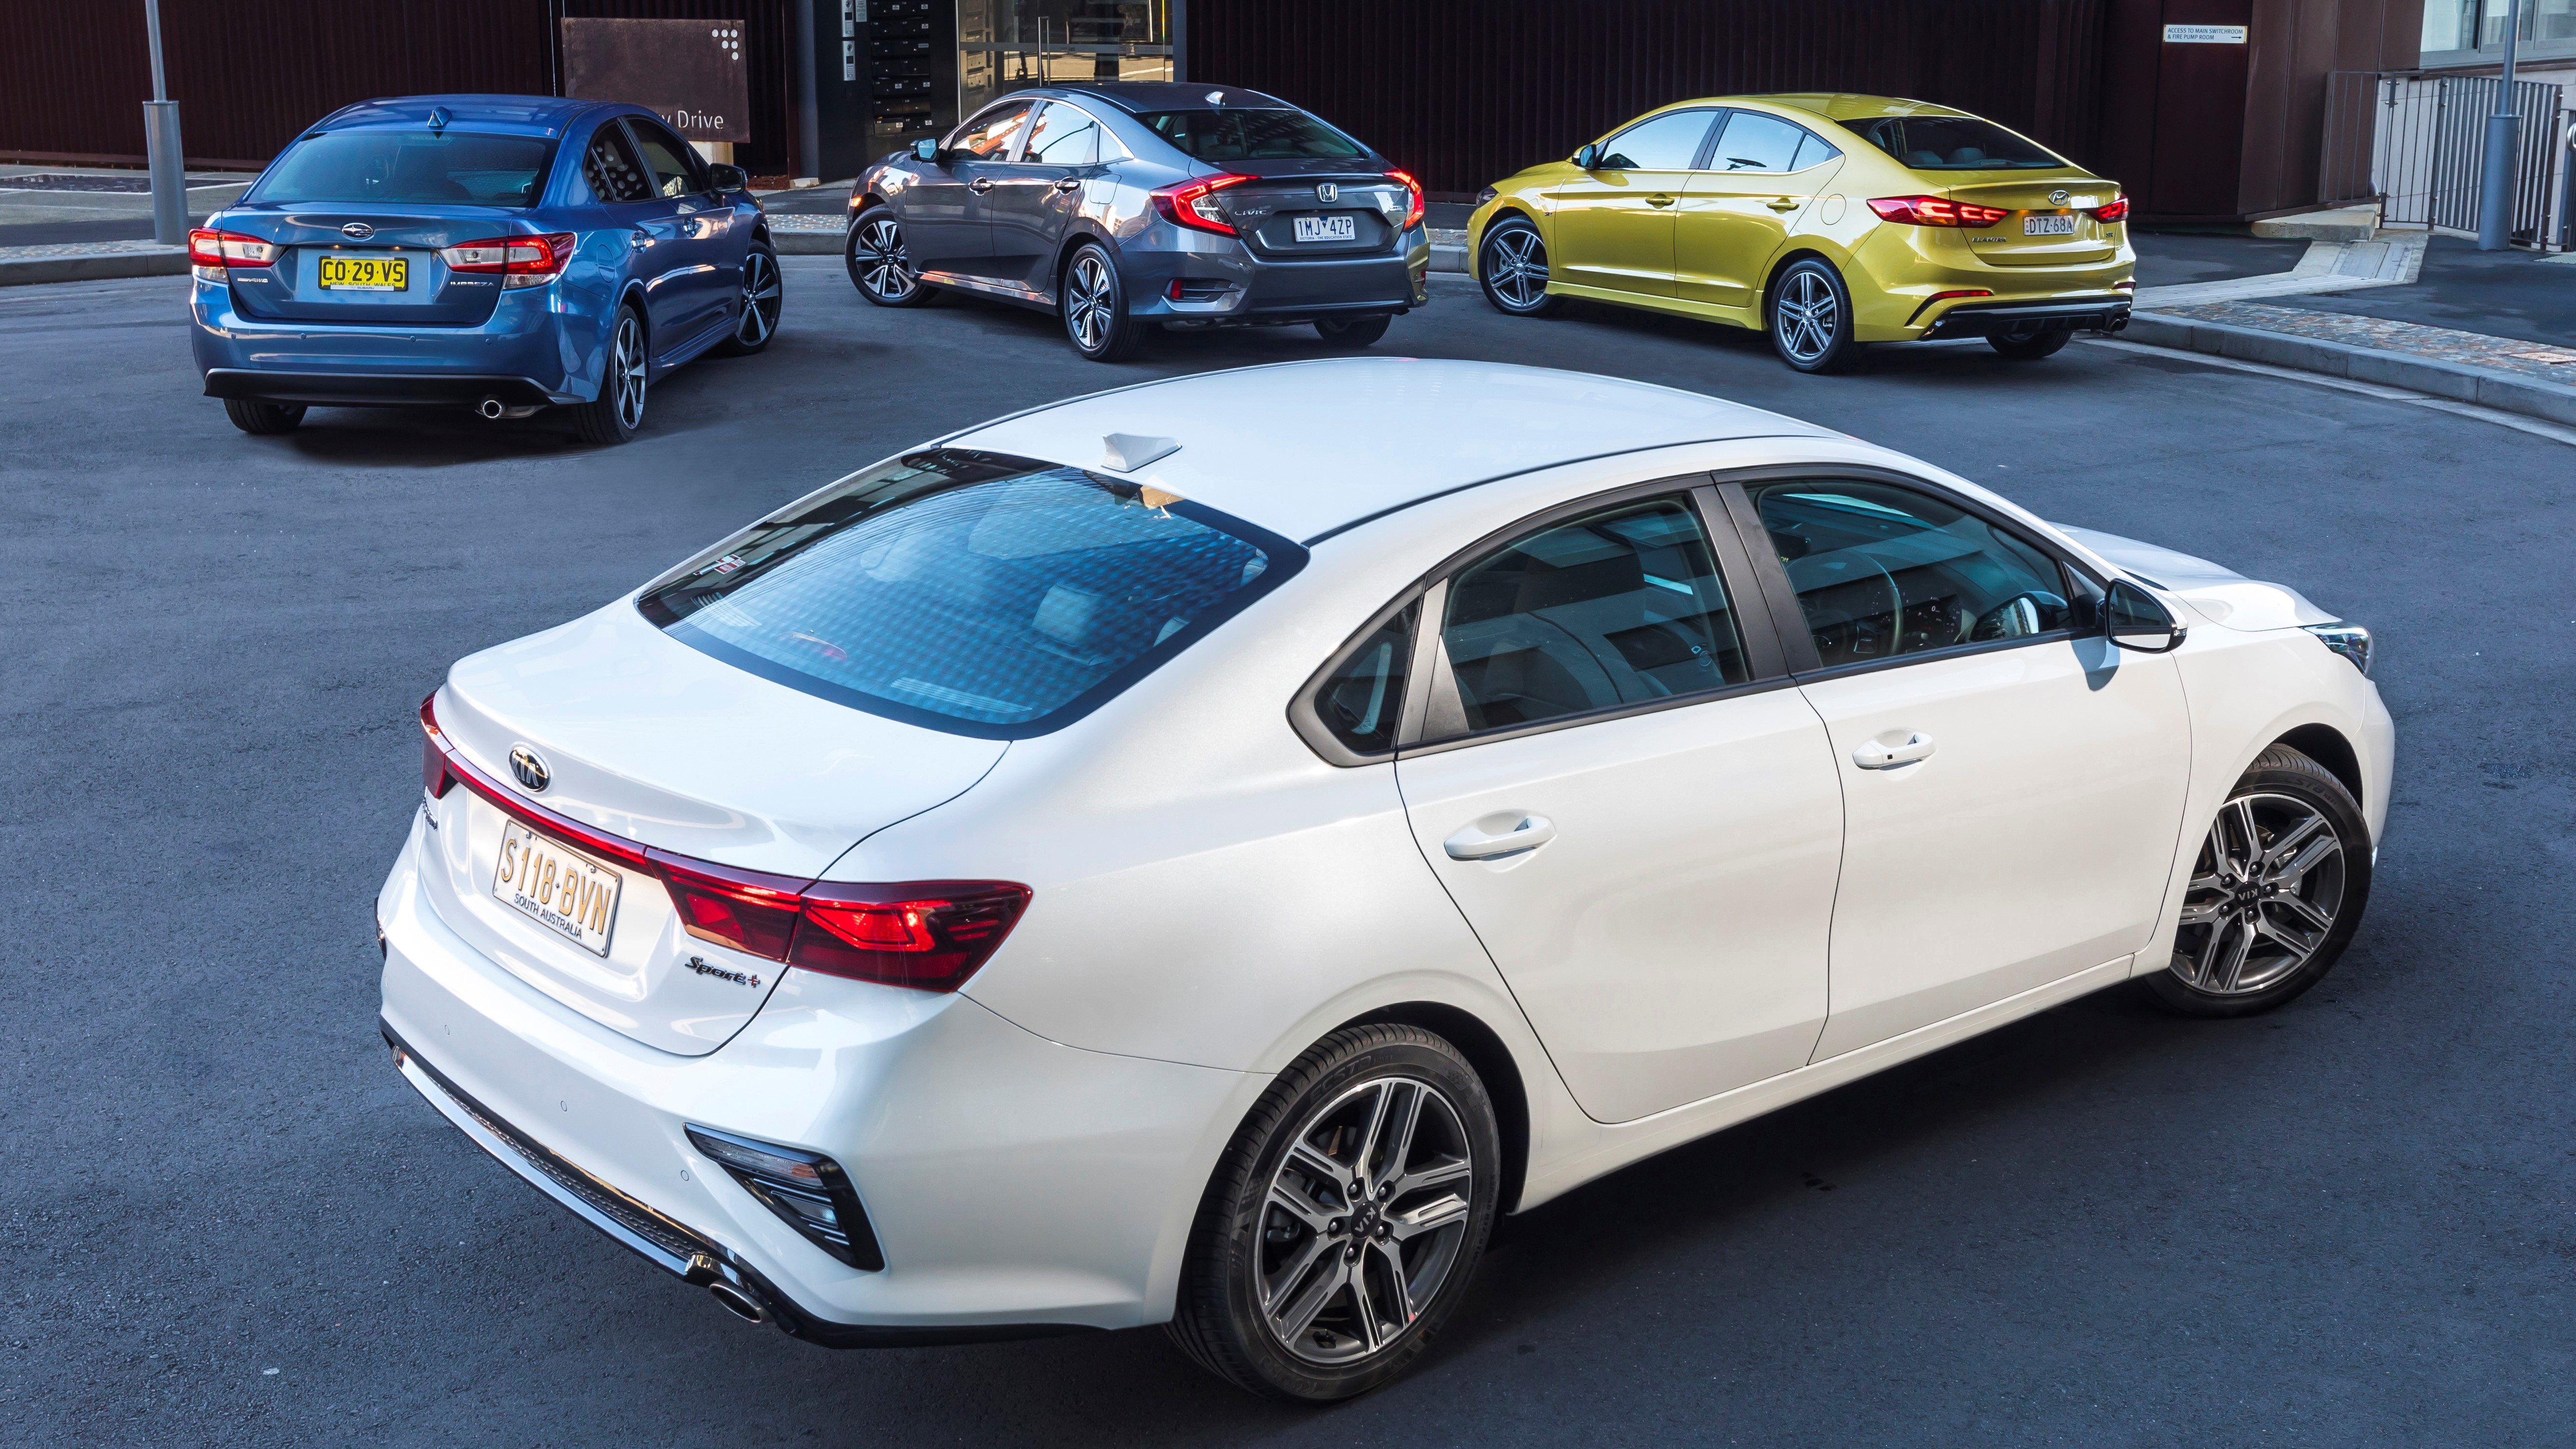 Small car comparison: Kia Cerato, Hyundai Elantra, Honda Civic and Subaru Impreza.